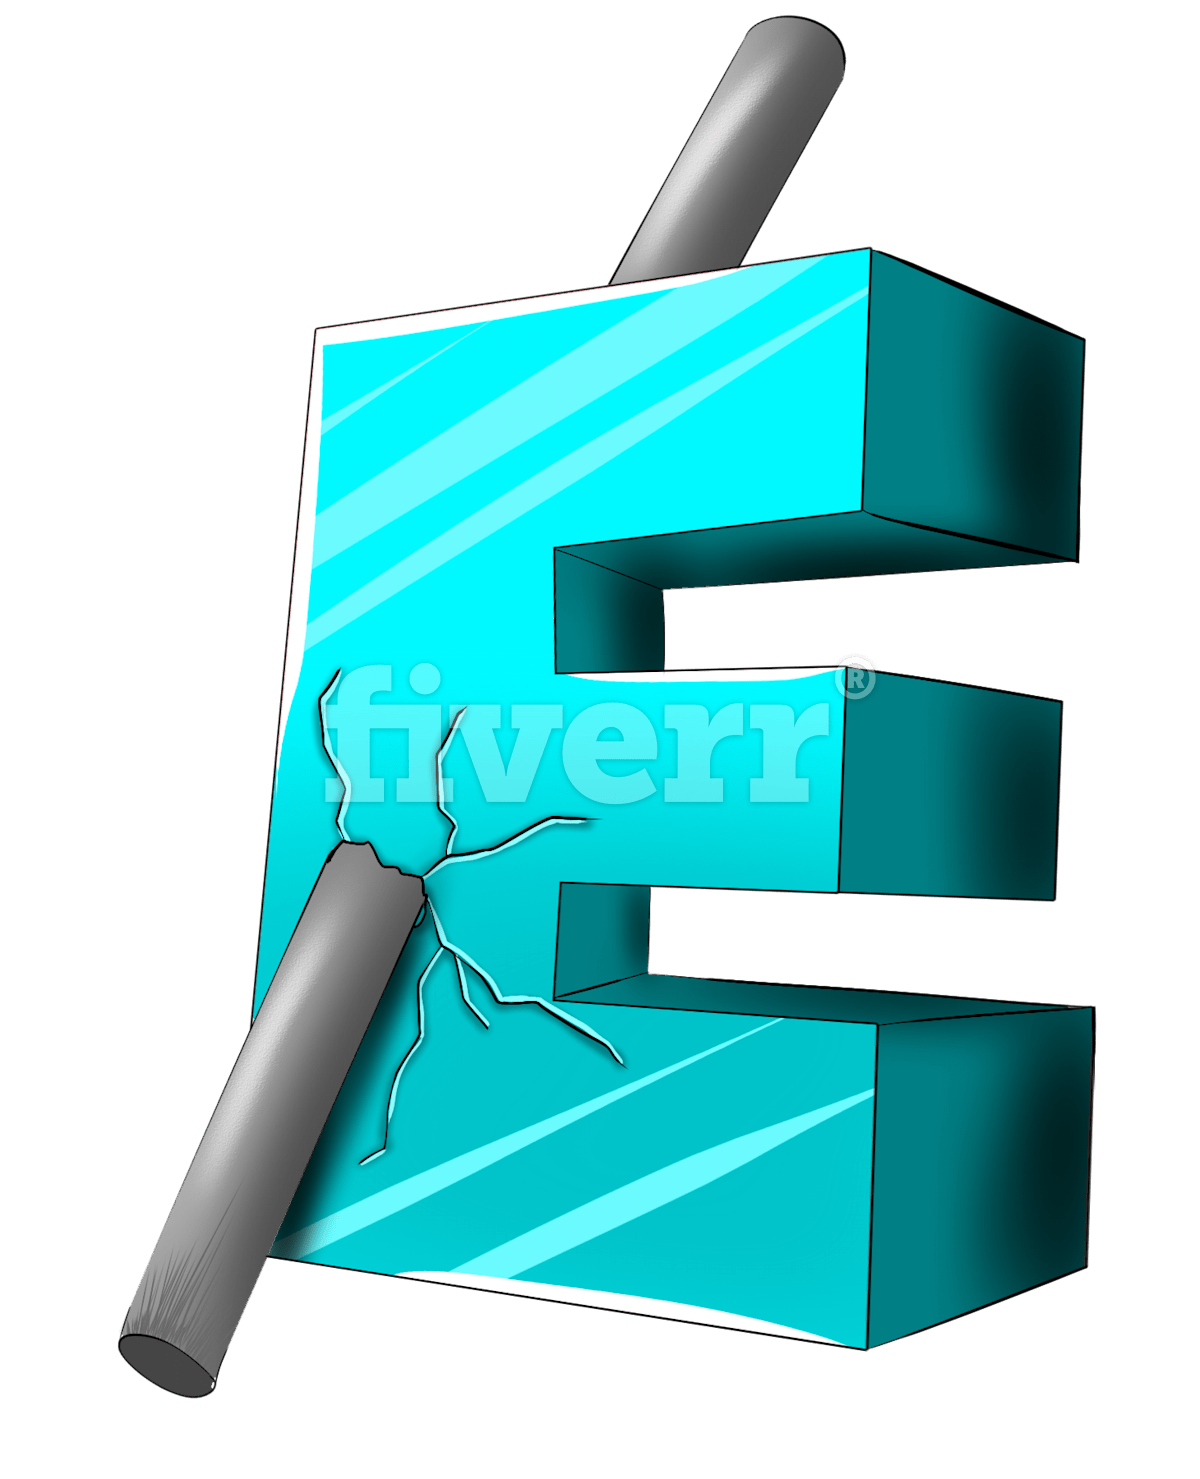 minecraft server icon not working